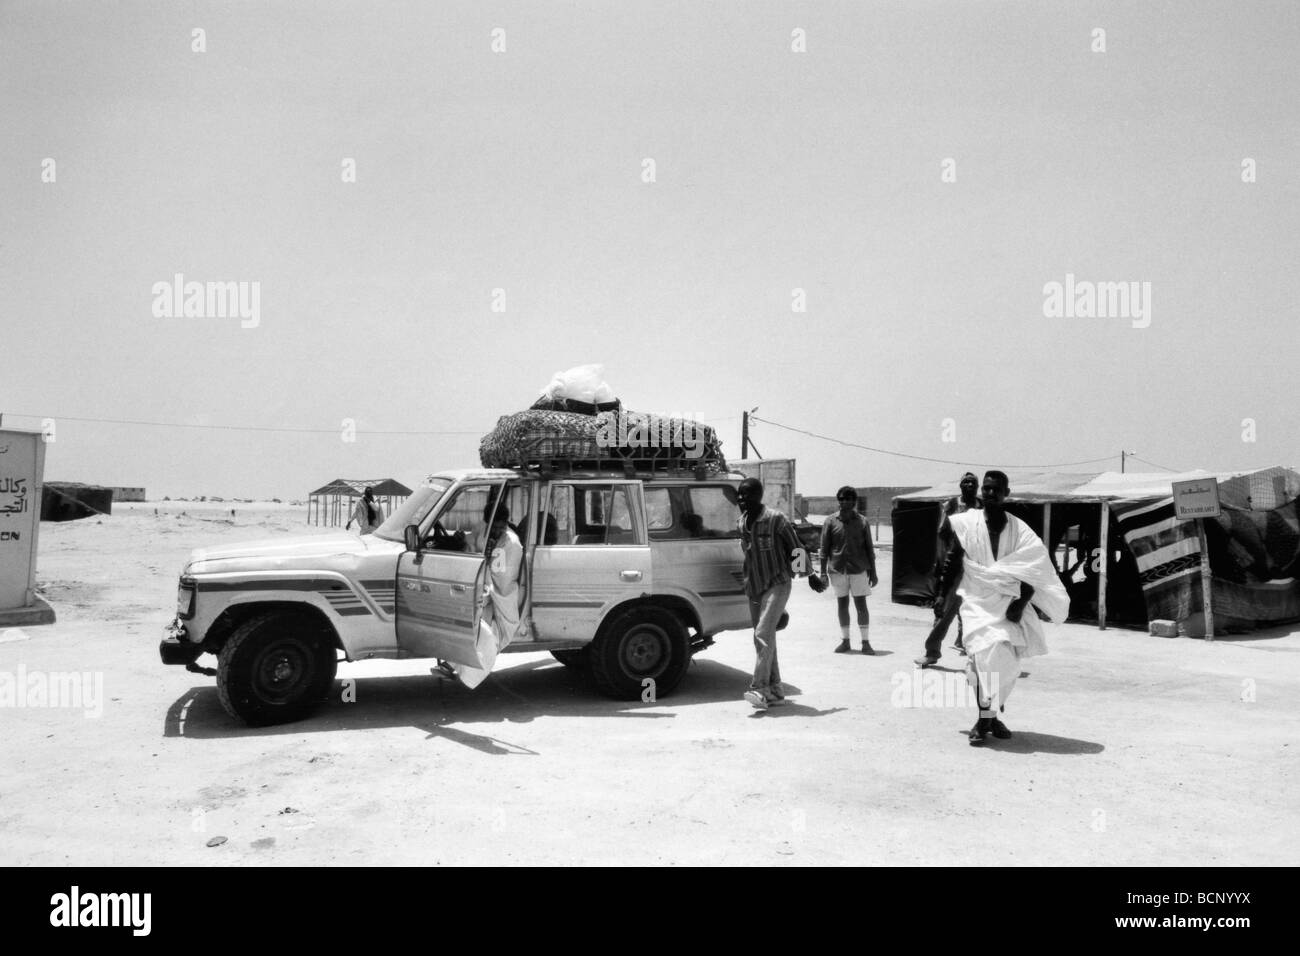 mauritania nouamghar - Stock Image